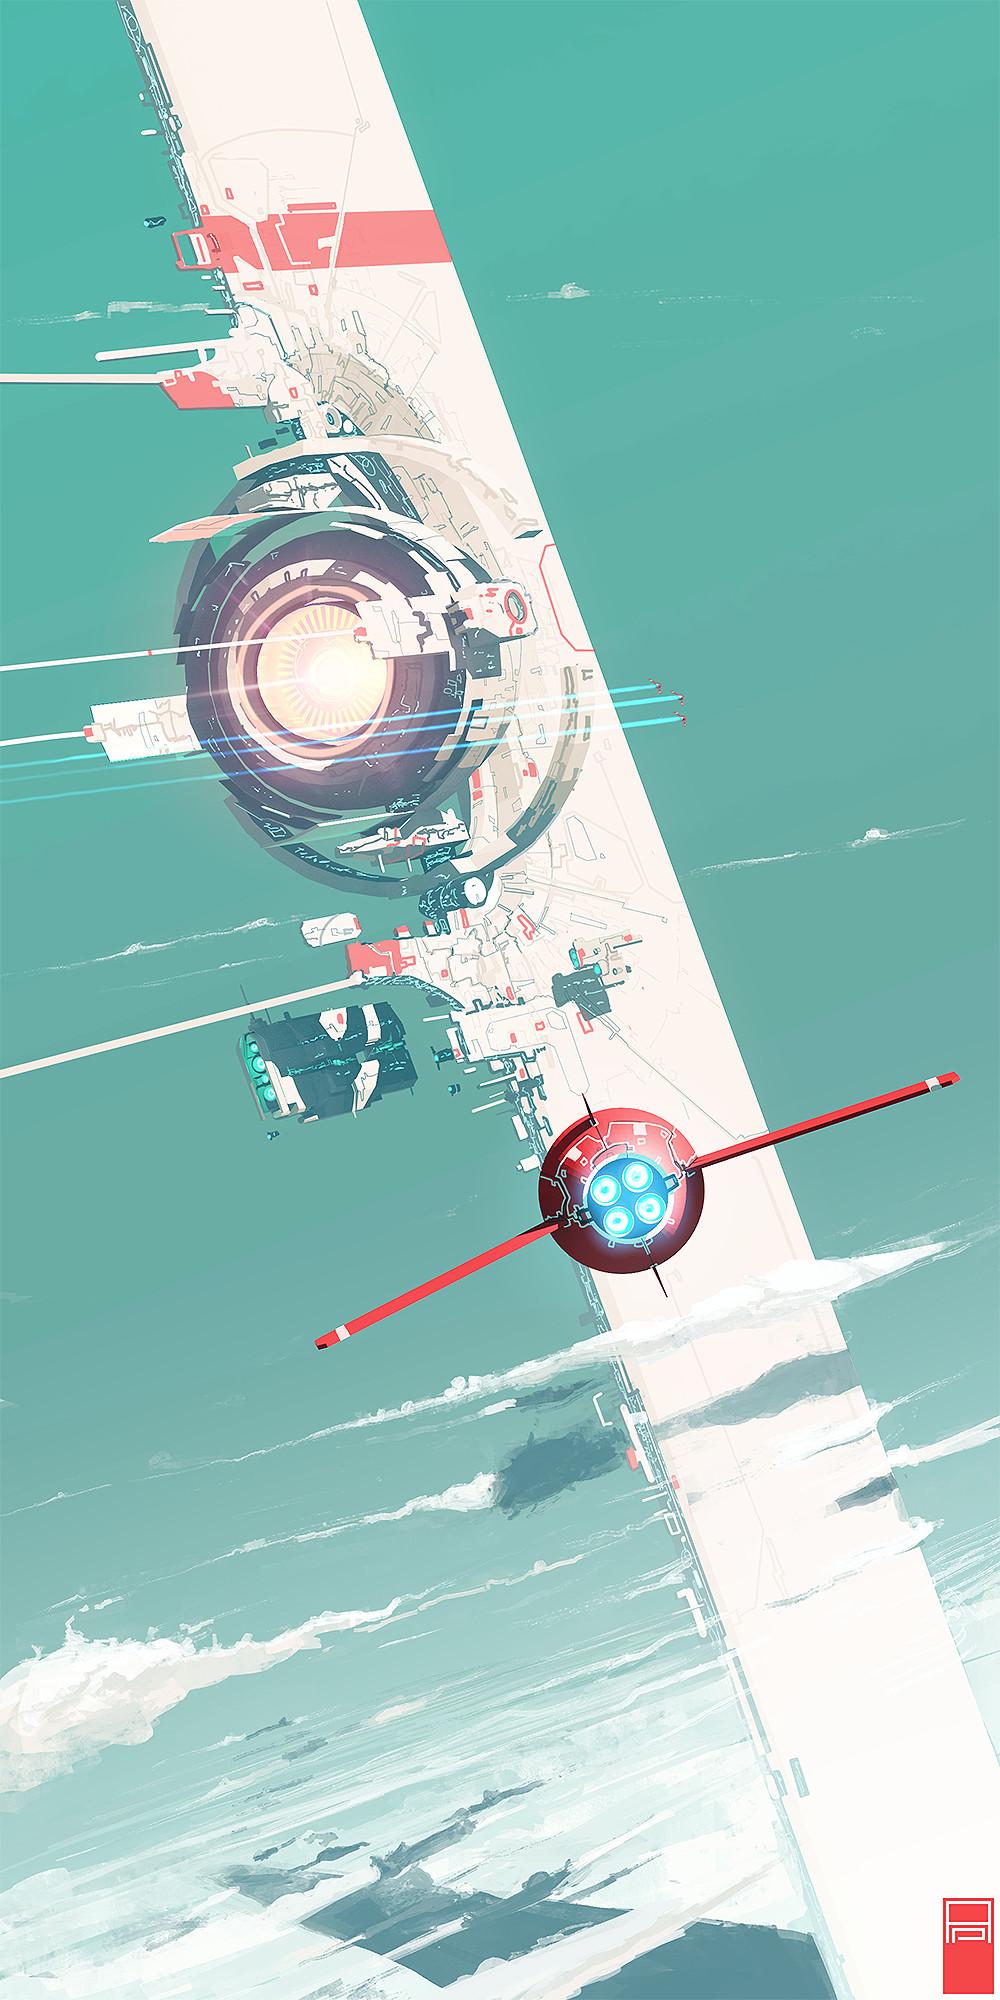 General 1000x2000 fantasy ship science fiction Technomancer futuristic spaceship vertical portrait display